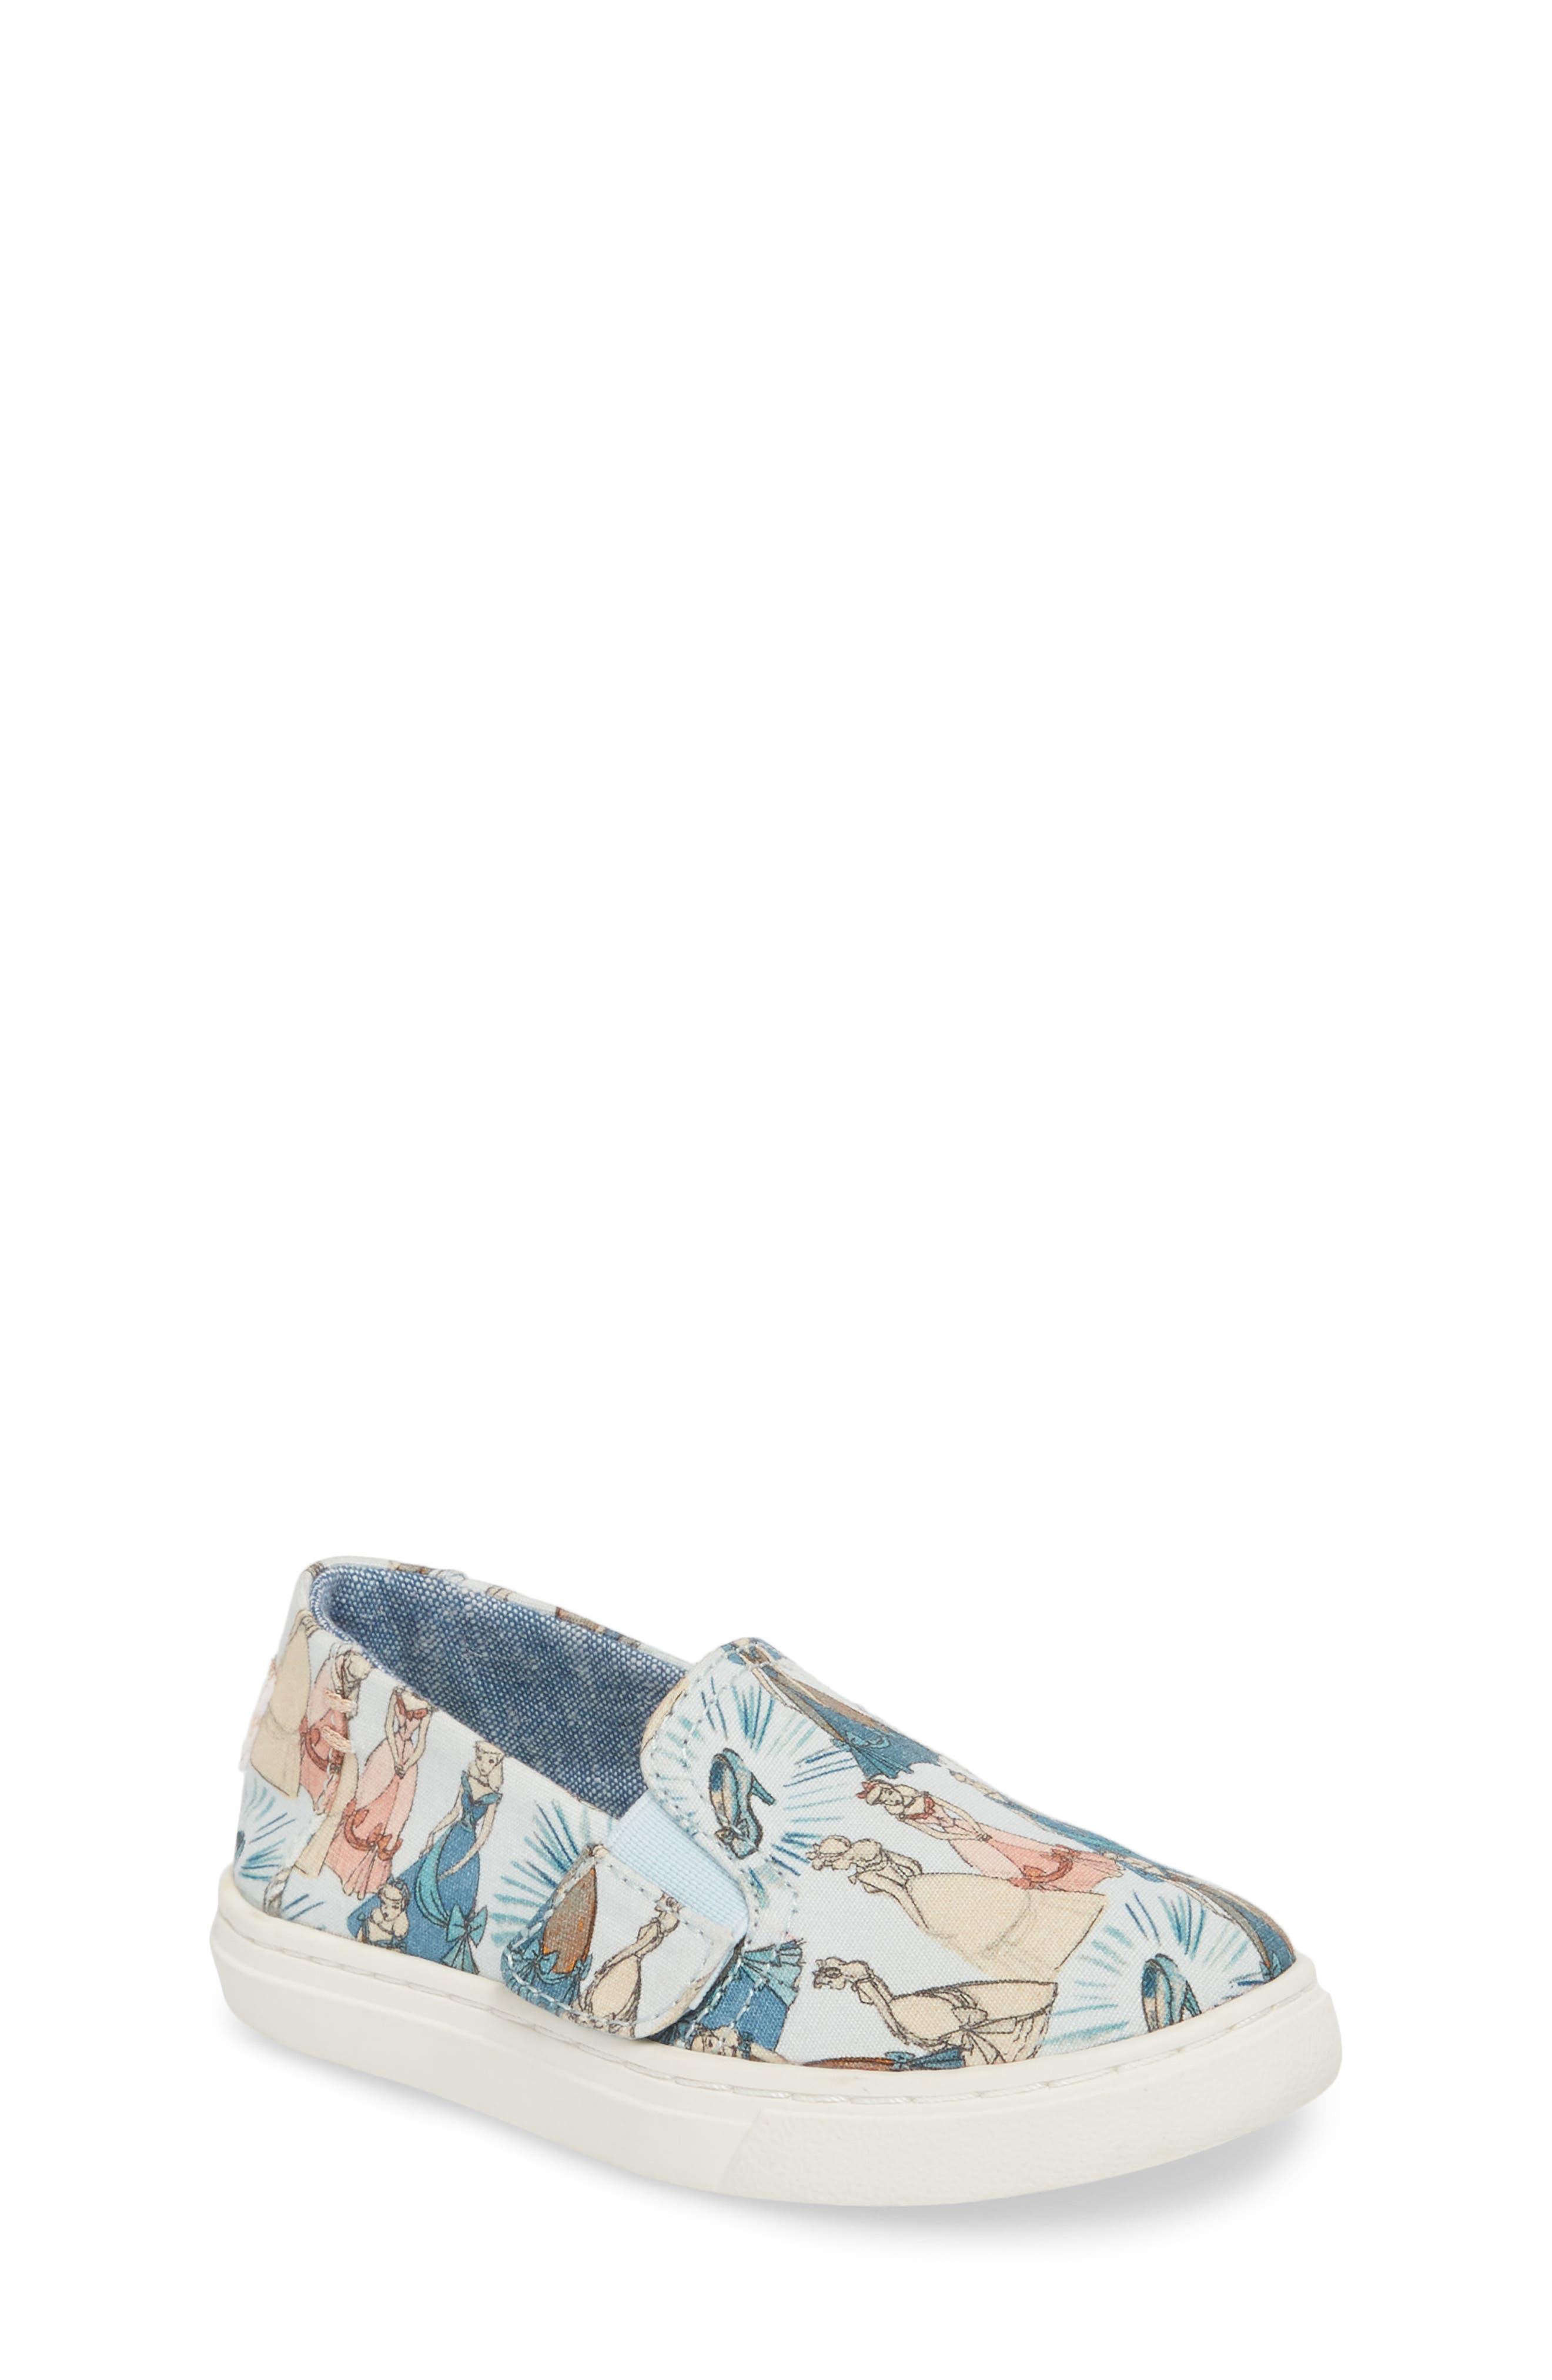 x Disney Luca Slip-On,                         Main,                         color, CINDERELLA BLUE PRINT